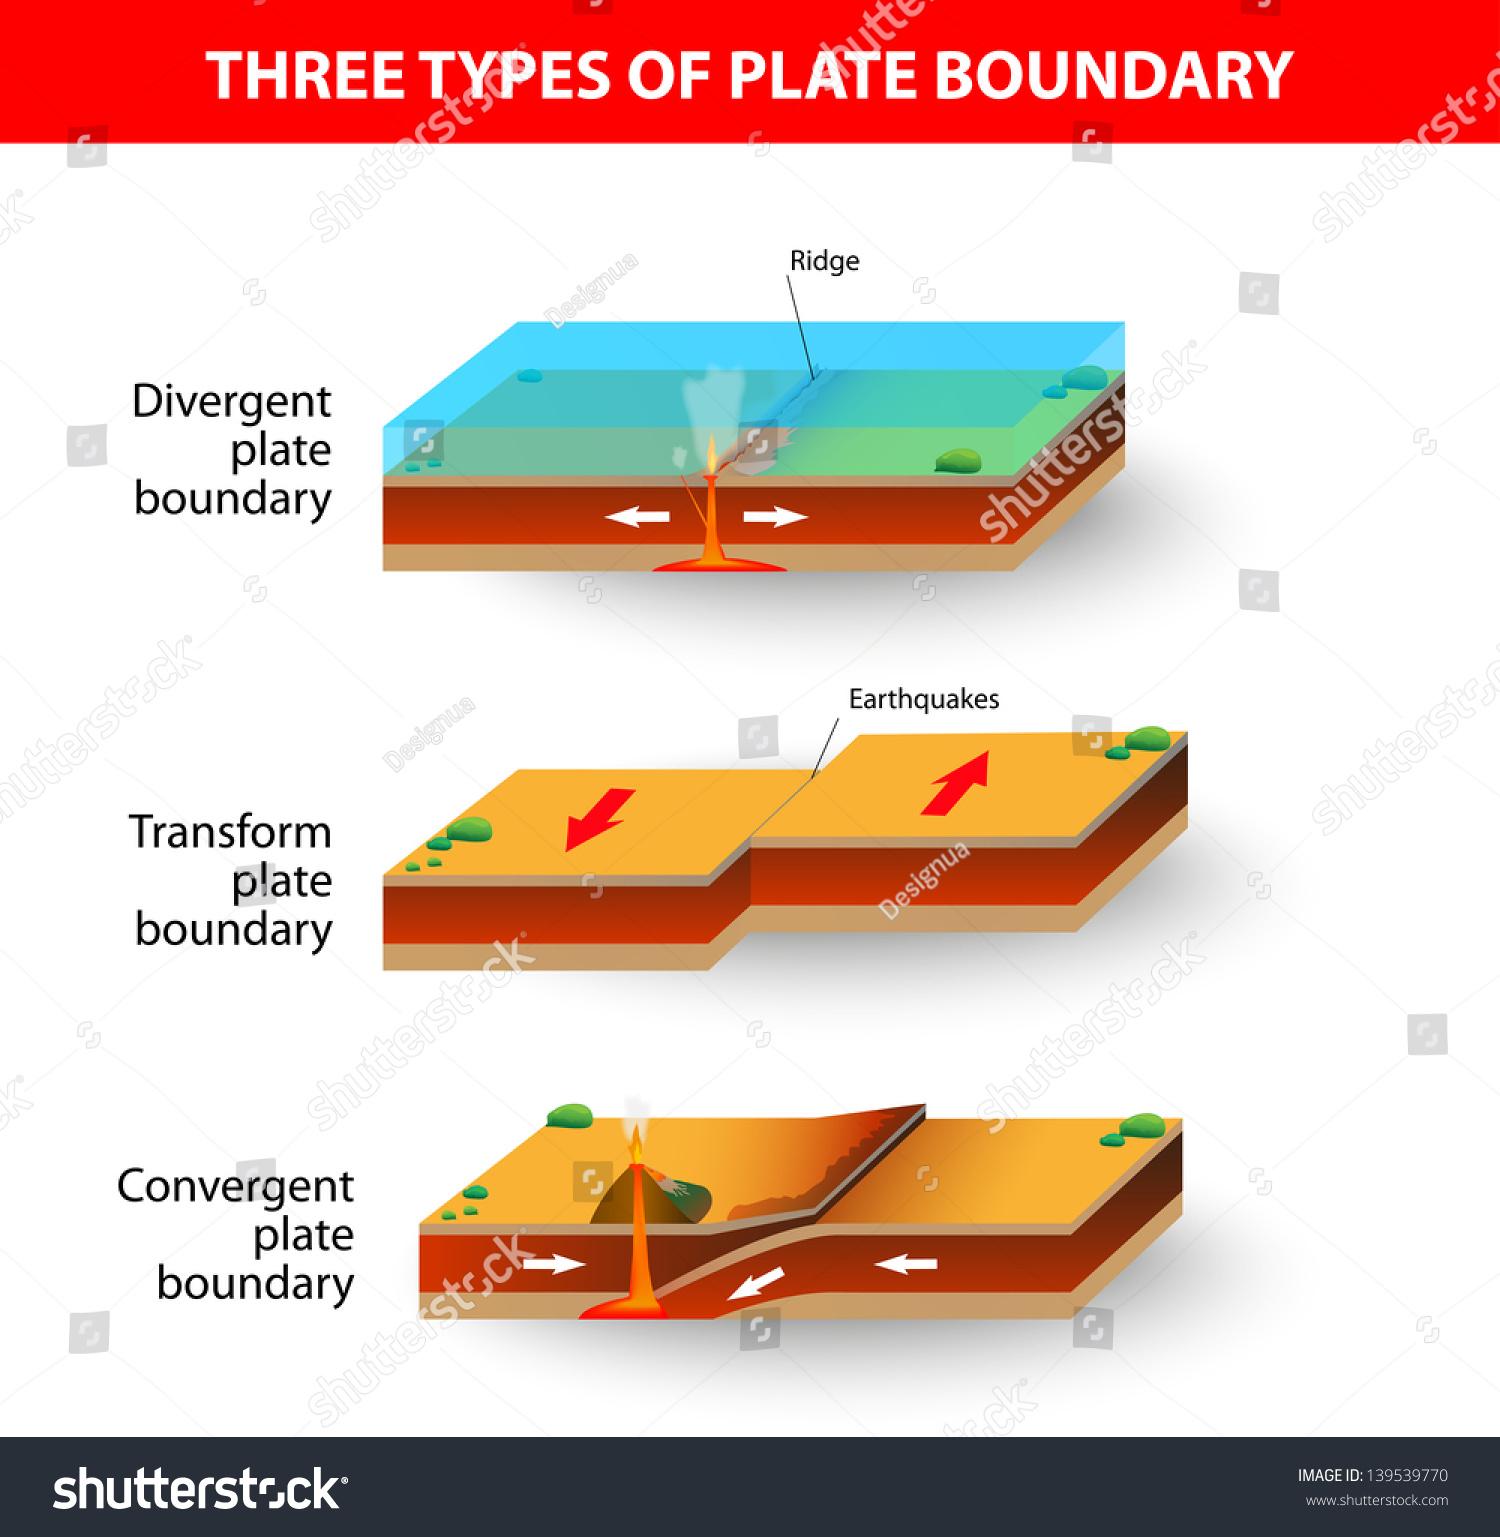 convergent boundary diagram human anatomy skeletal cross section illustrating main types tectonic stock